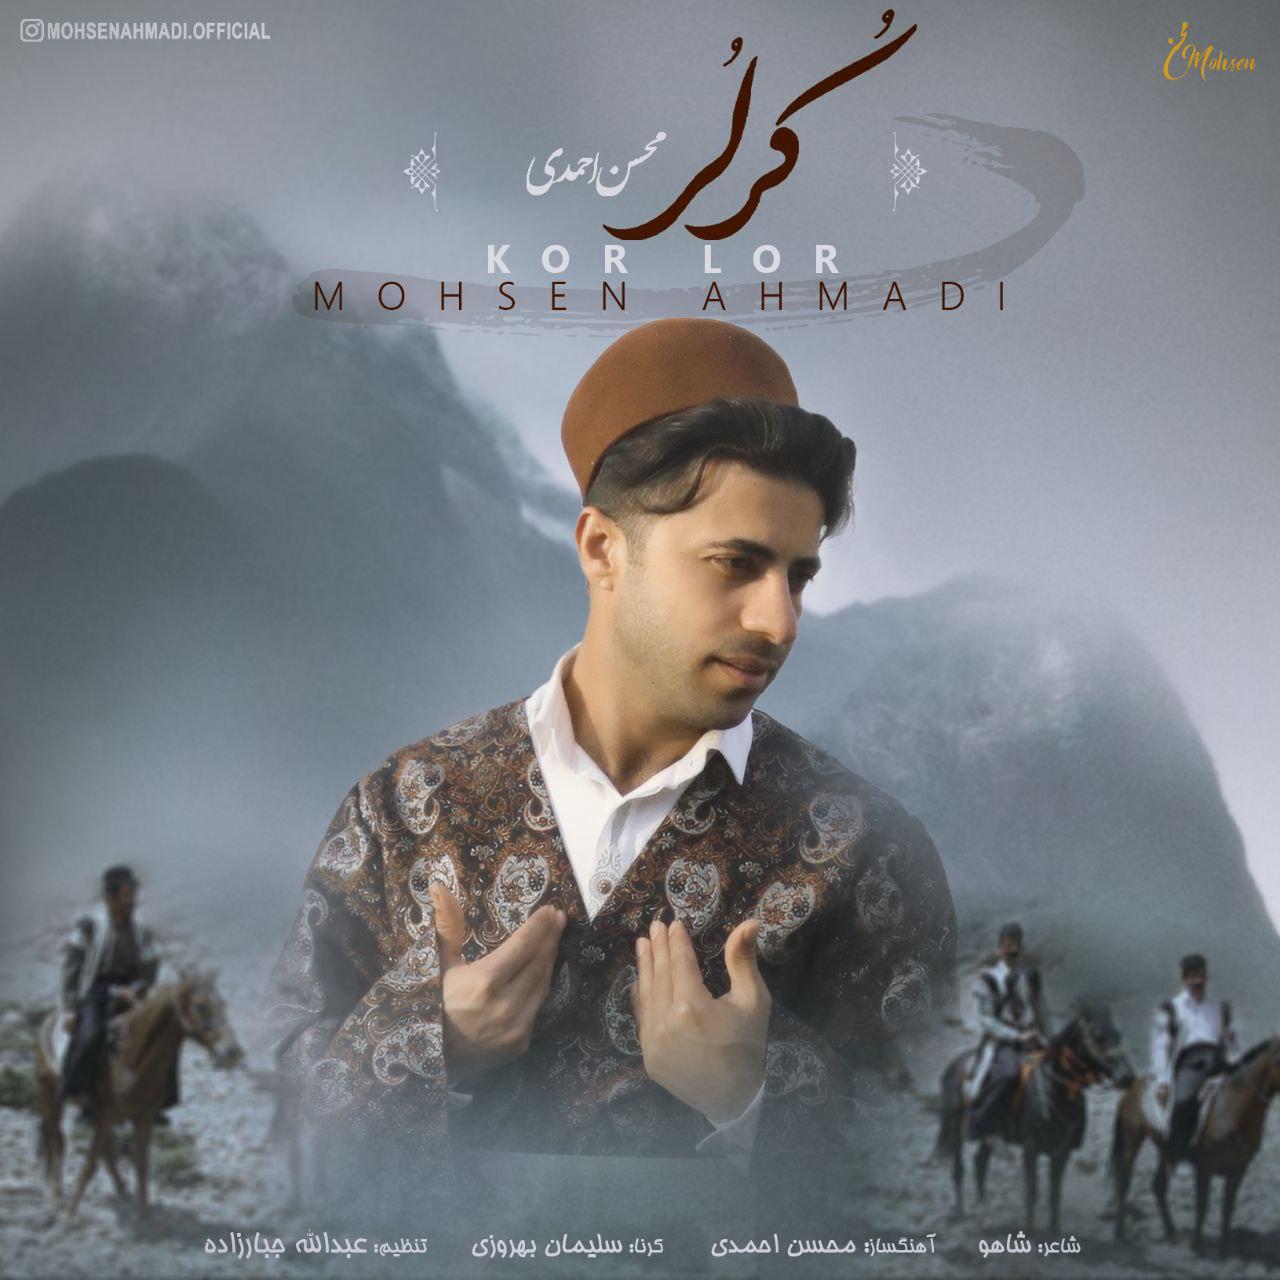 محسن احمدی کر لر